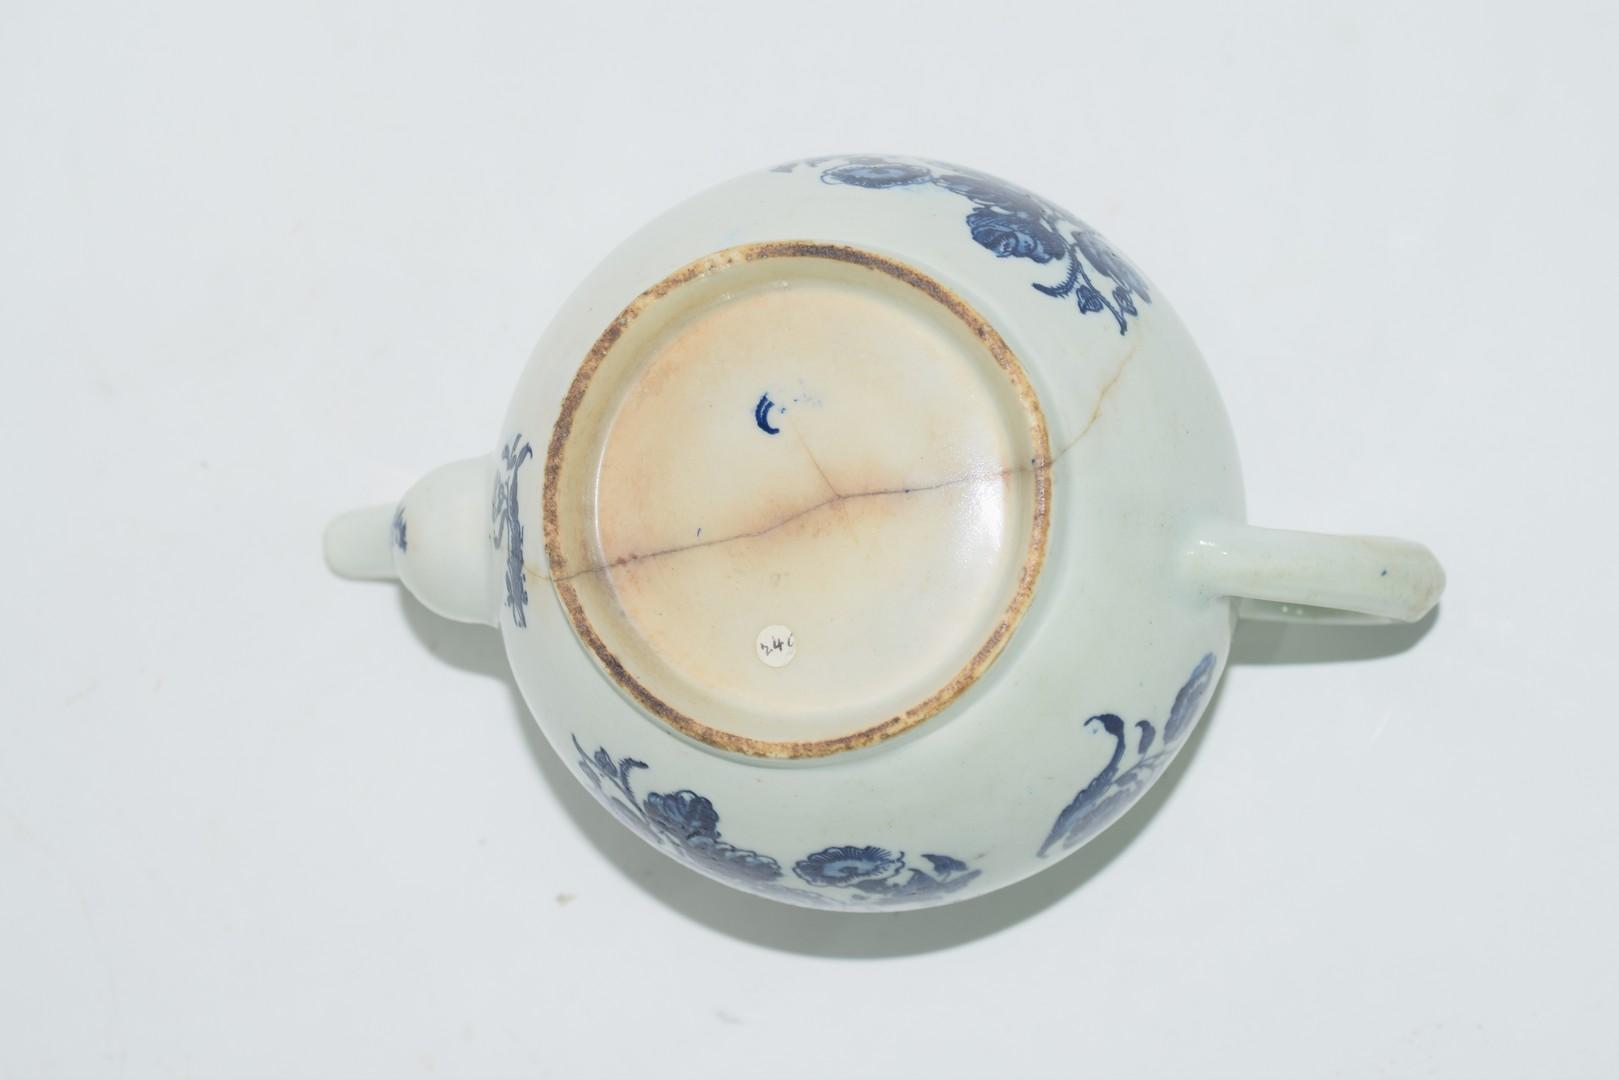 18th century Lowestoft porcelain teapot - Image 7 of 8